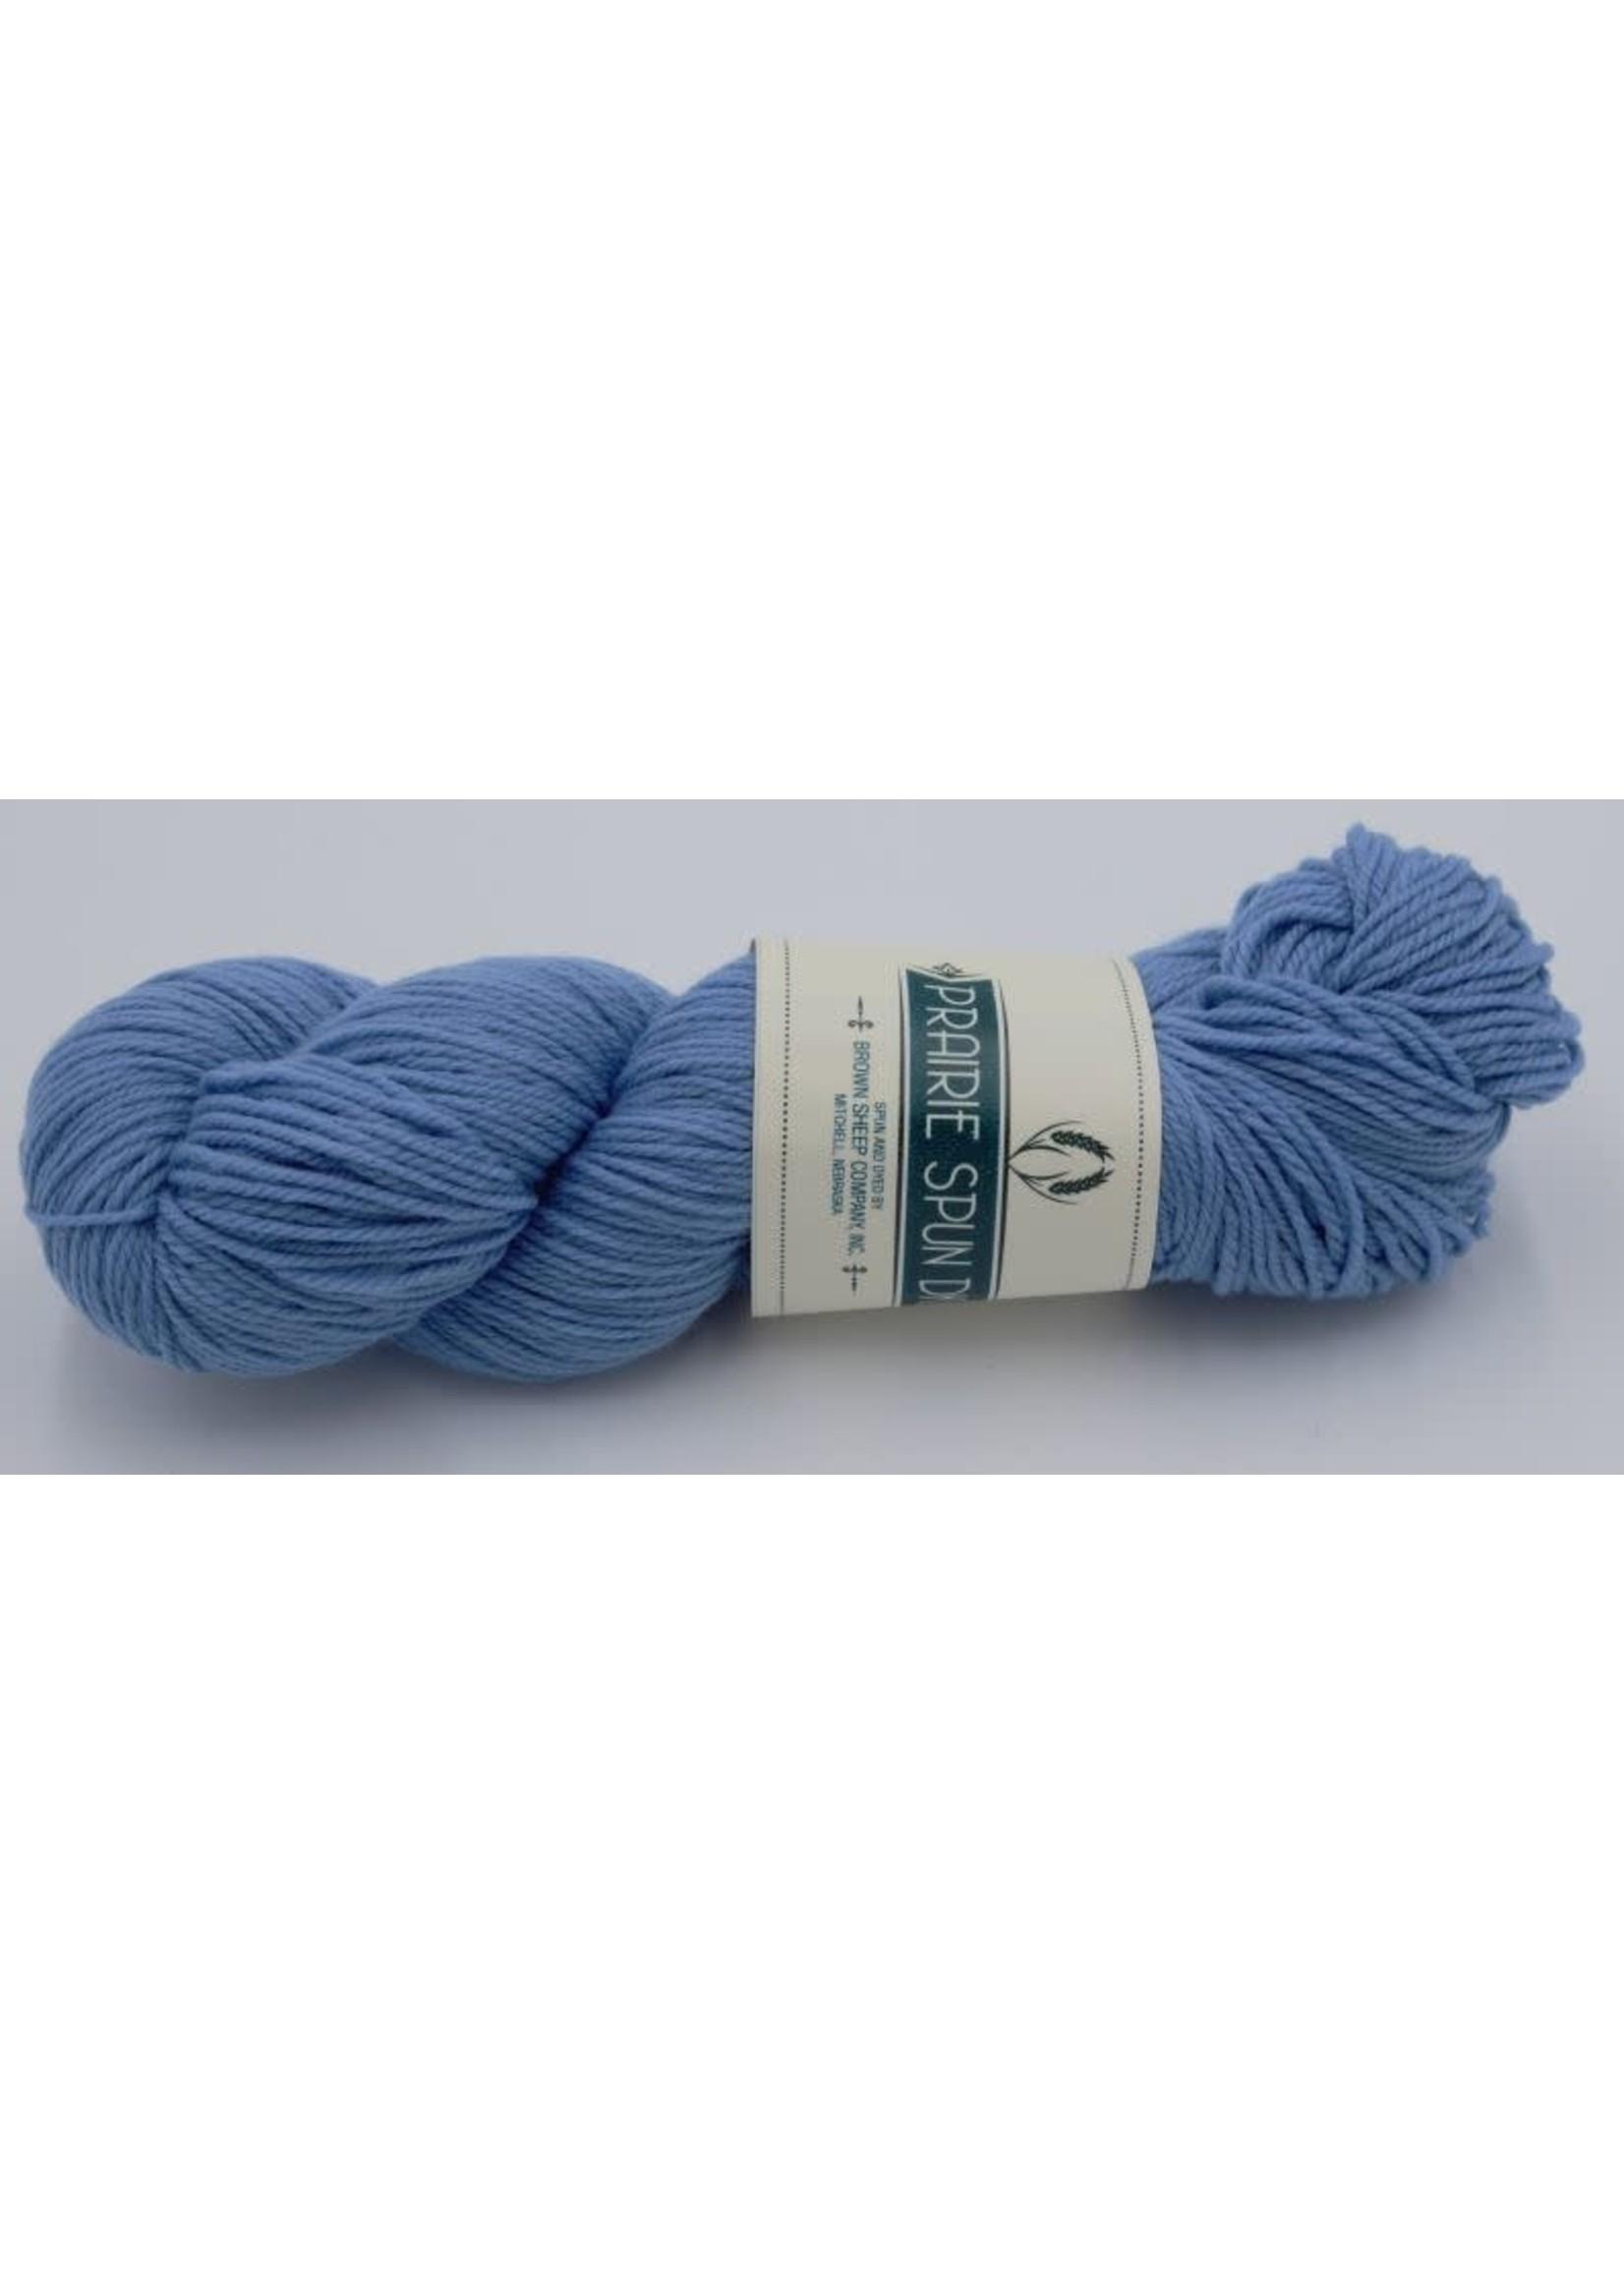 Brown Sheep Company Brown Sheep Prairie Spun Yarn